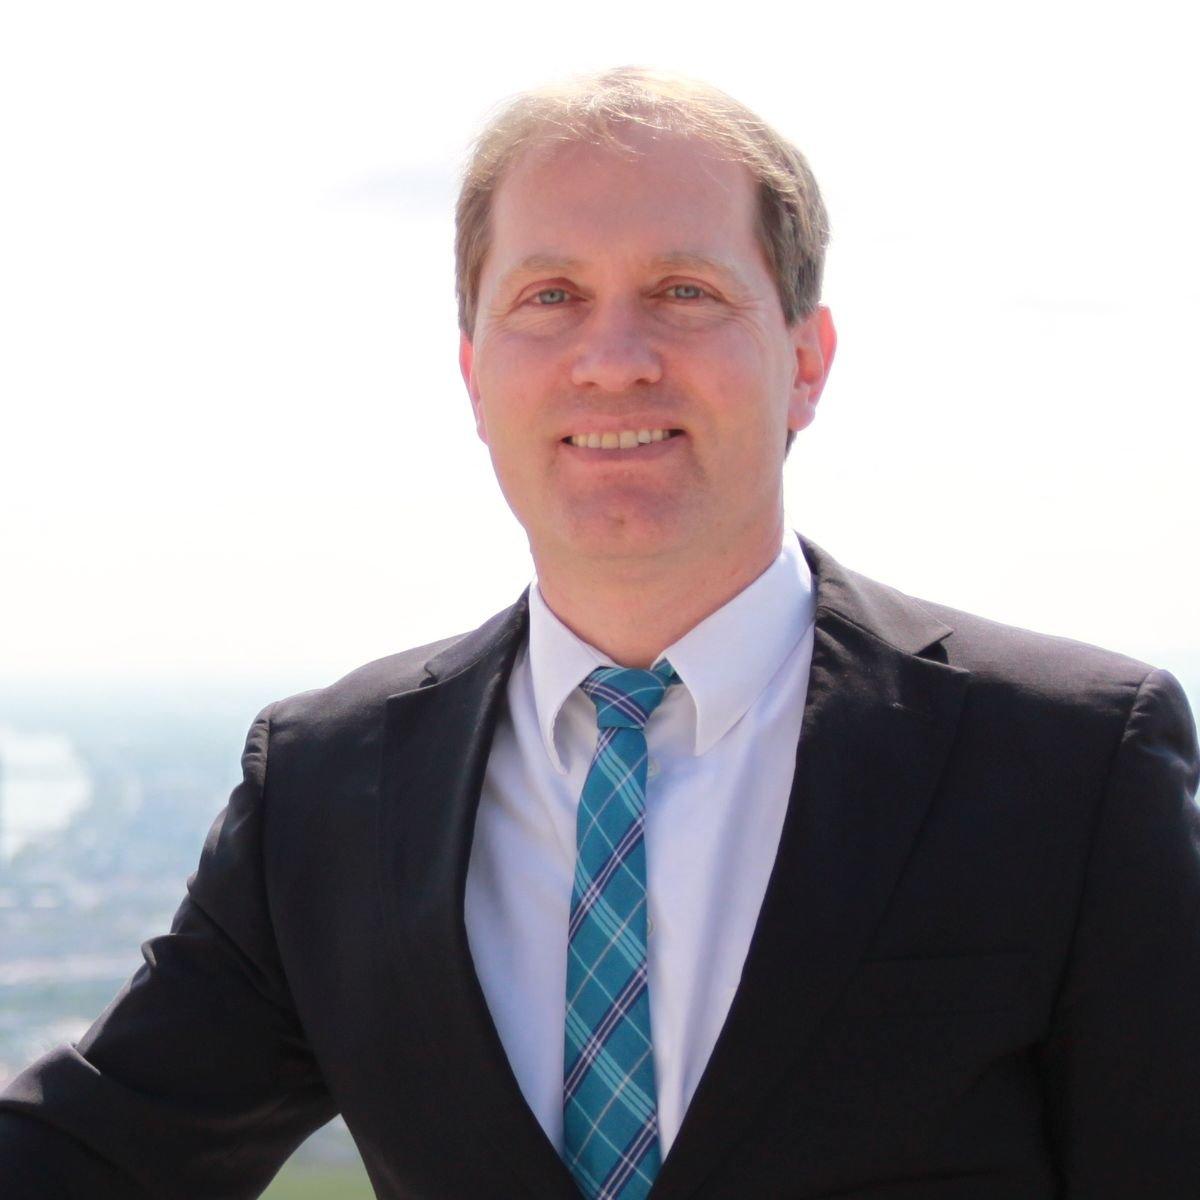 Prof. Dr. Horst Treiblmaier